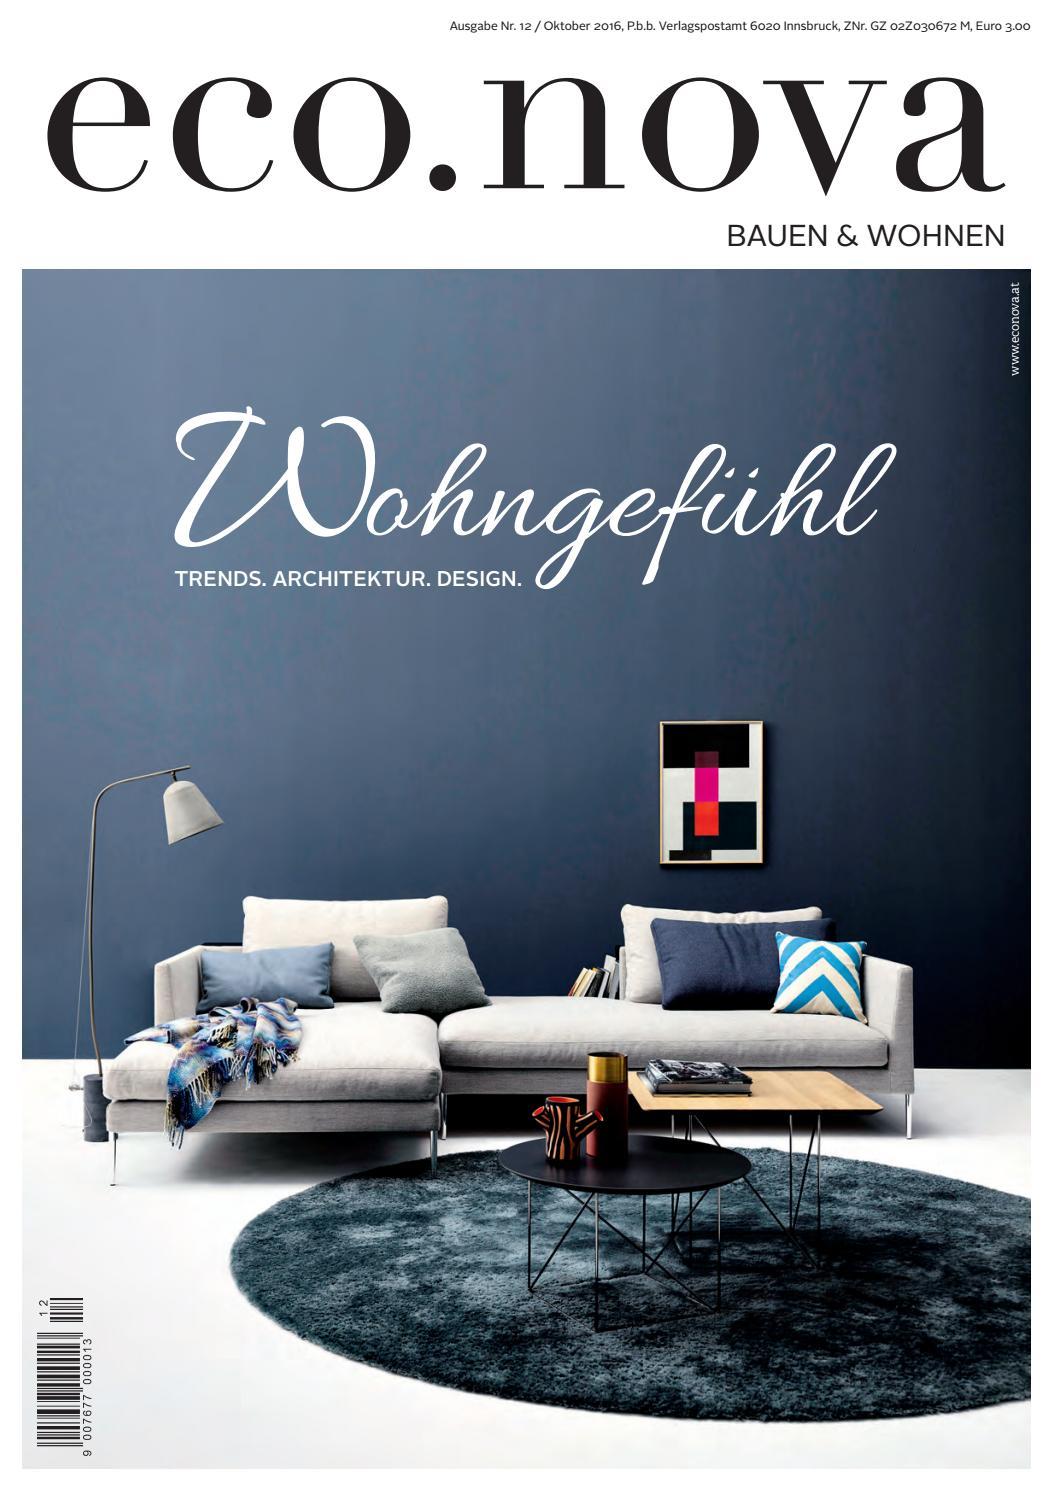 Eco.nova SPEZIAL Bauen U0026 Wohnen 2016 By Eco.nova Verlags Gmbh   Issuu